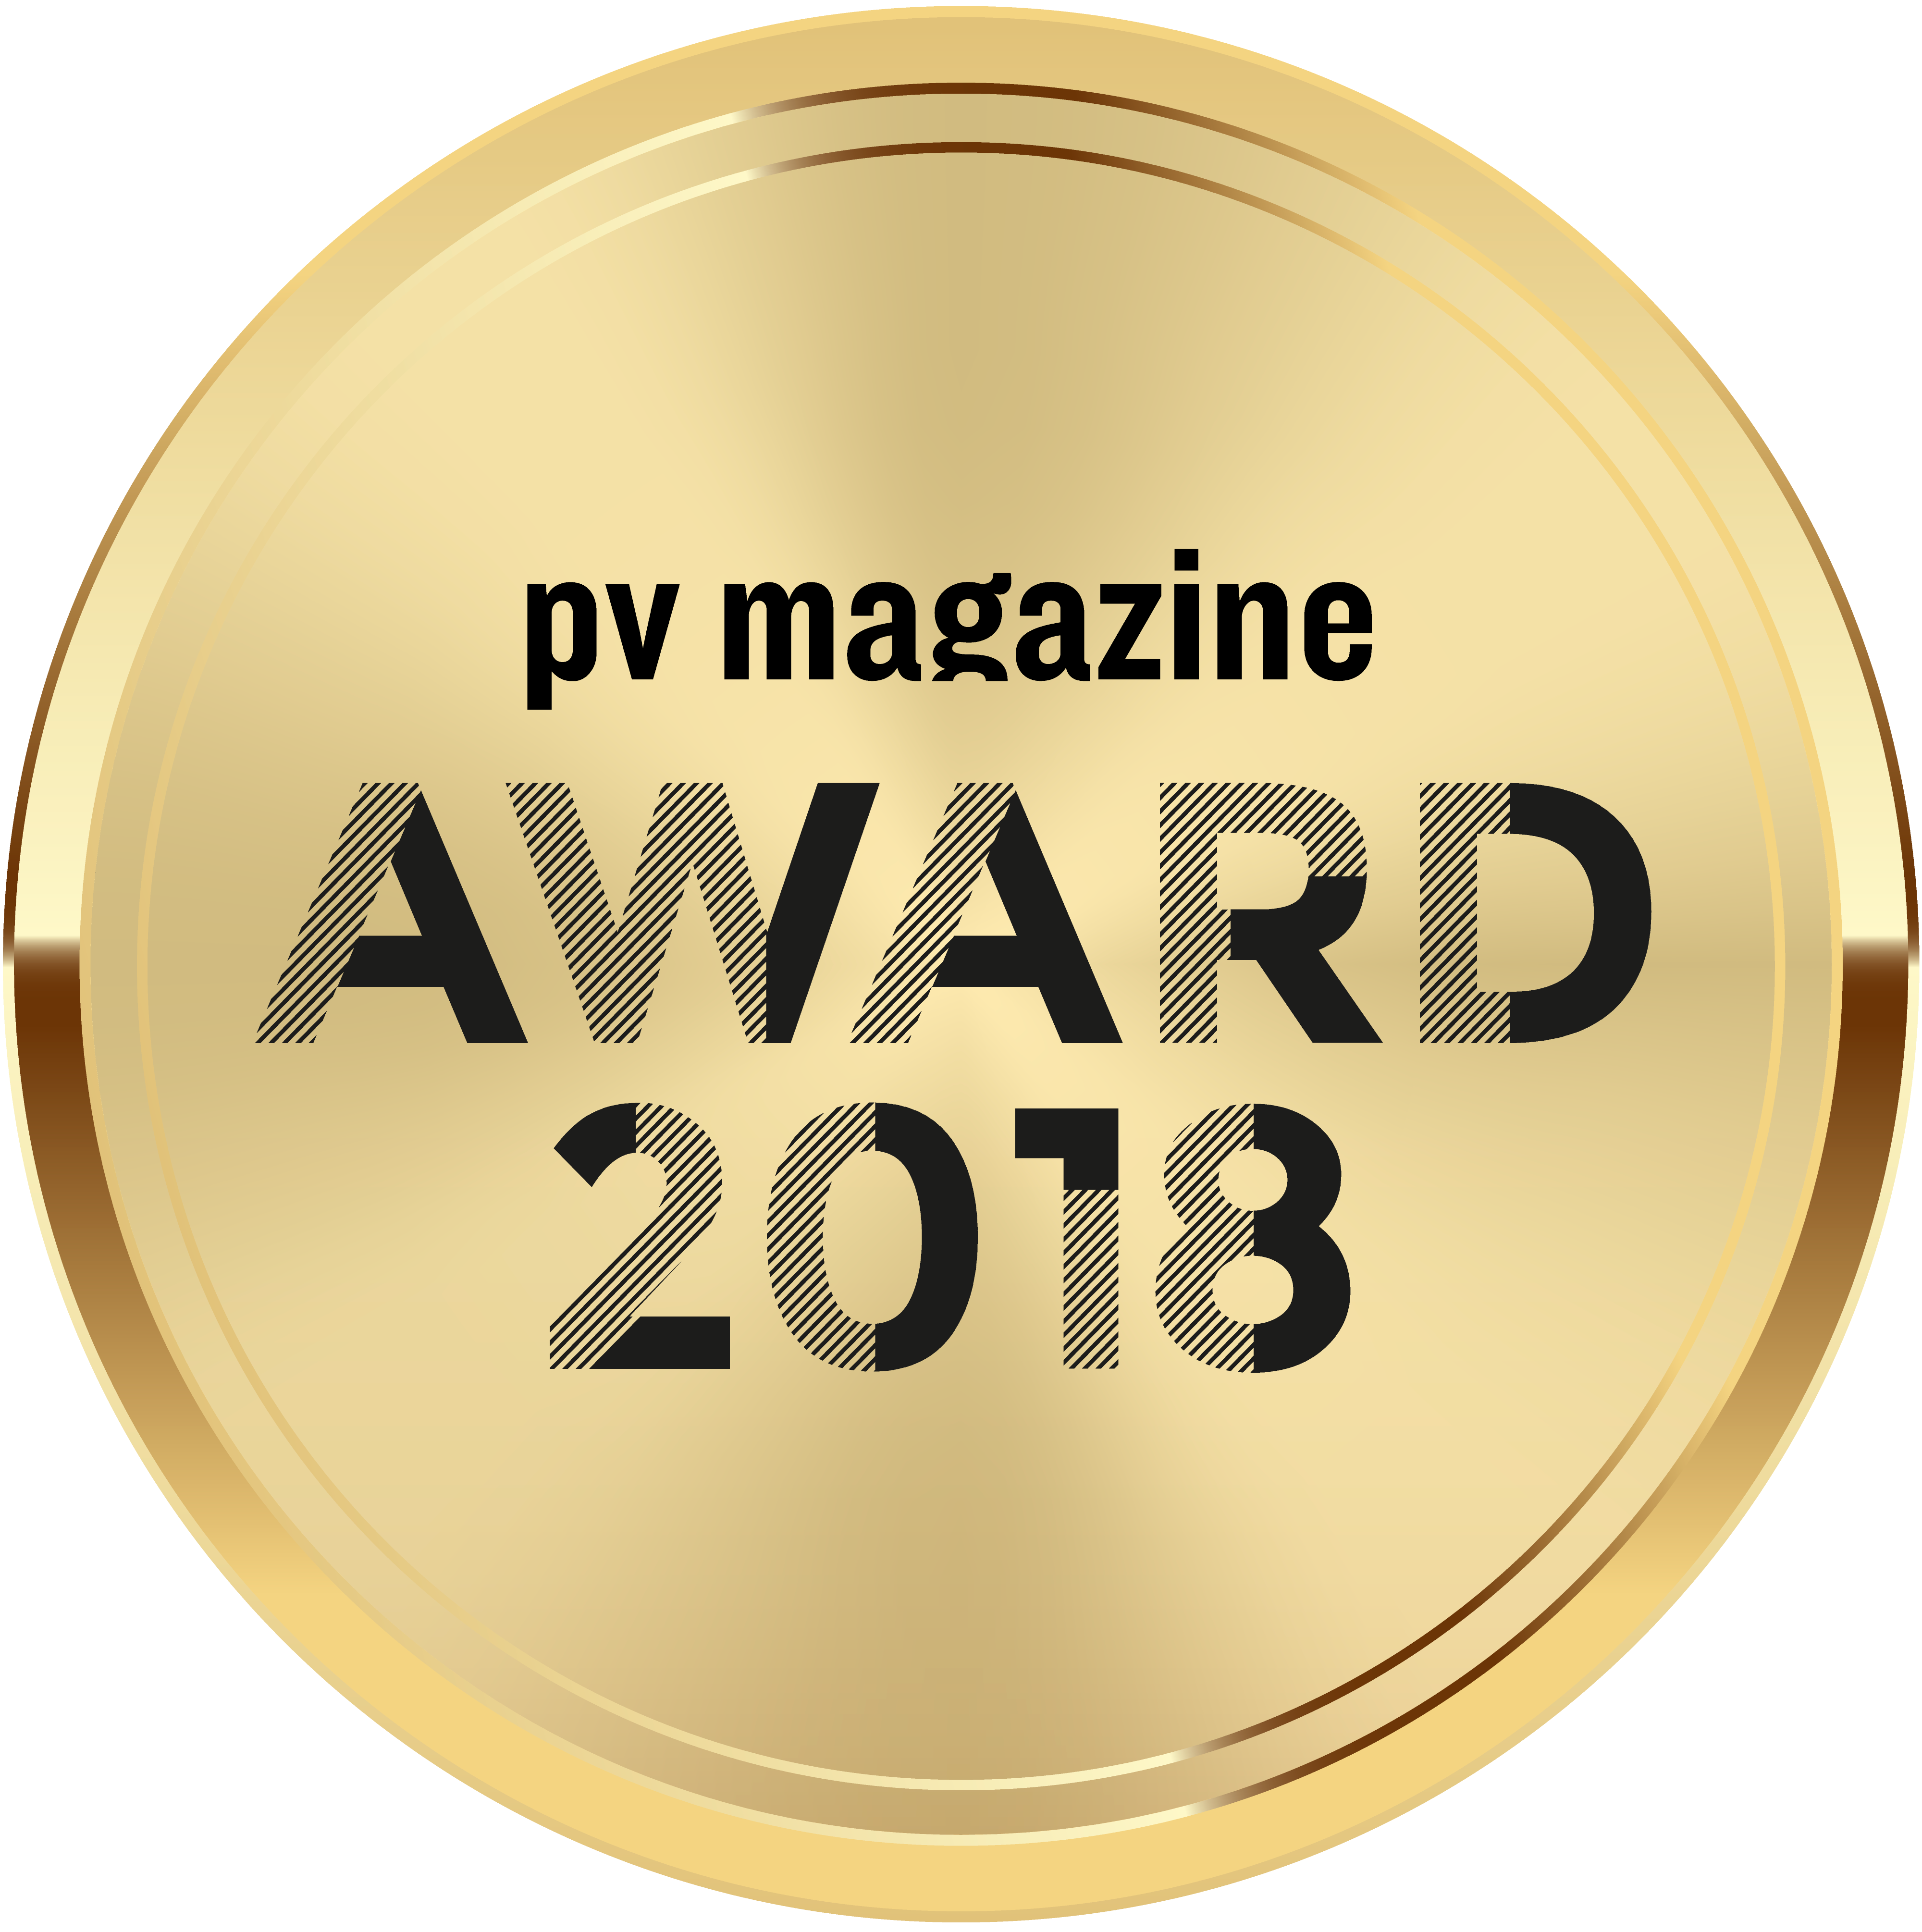 pv magazine Award 2018